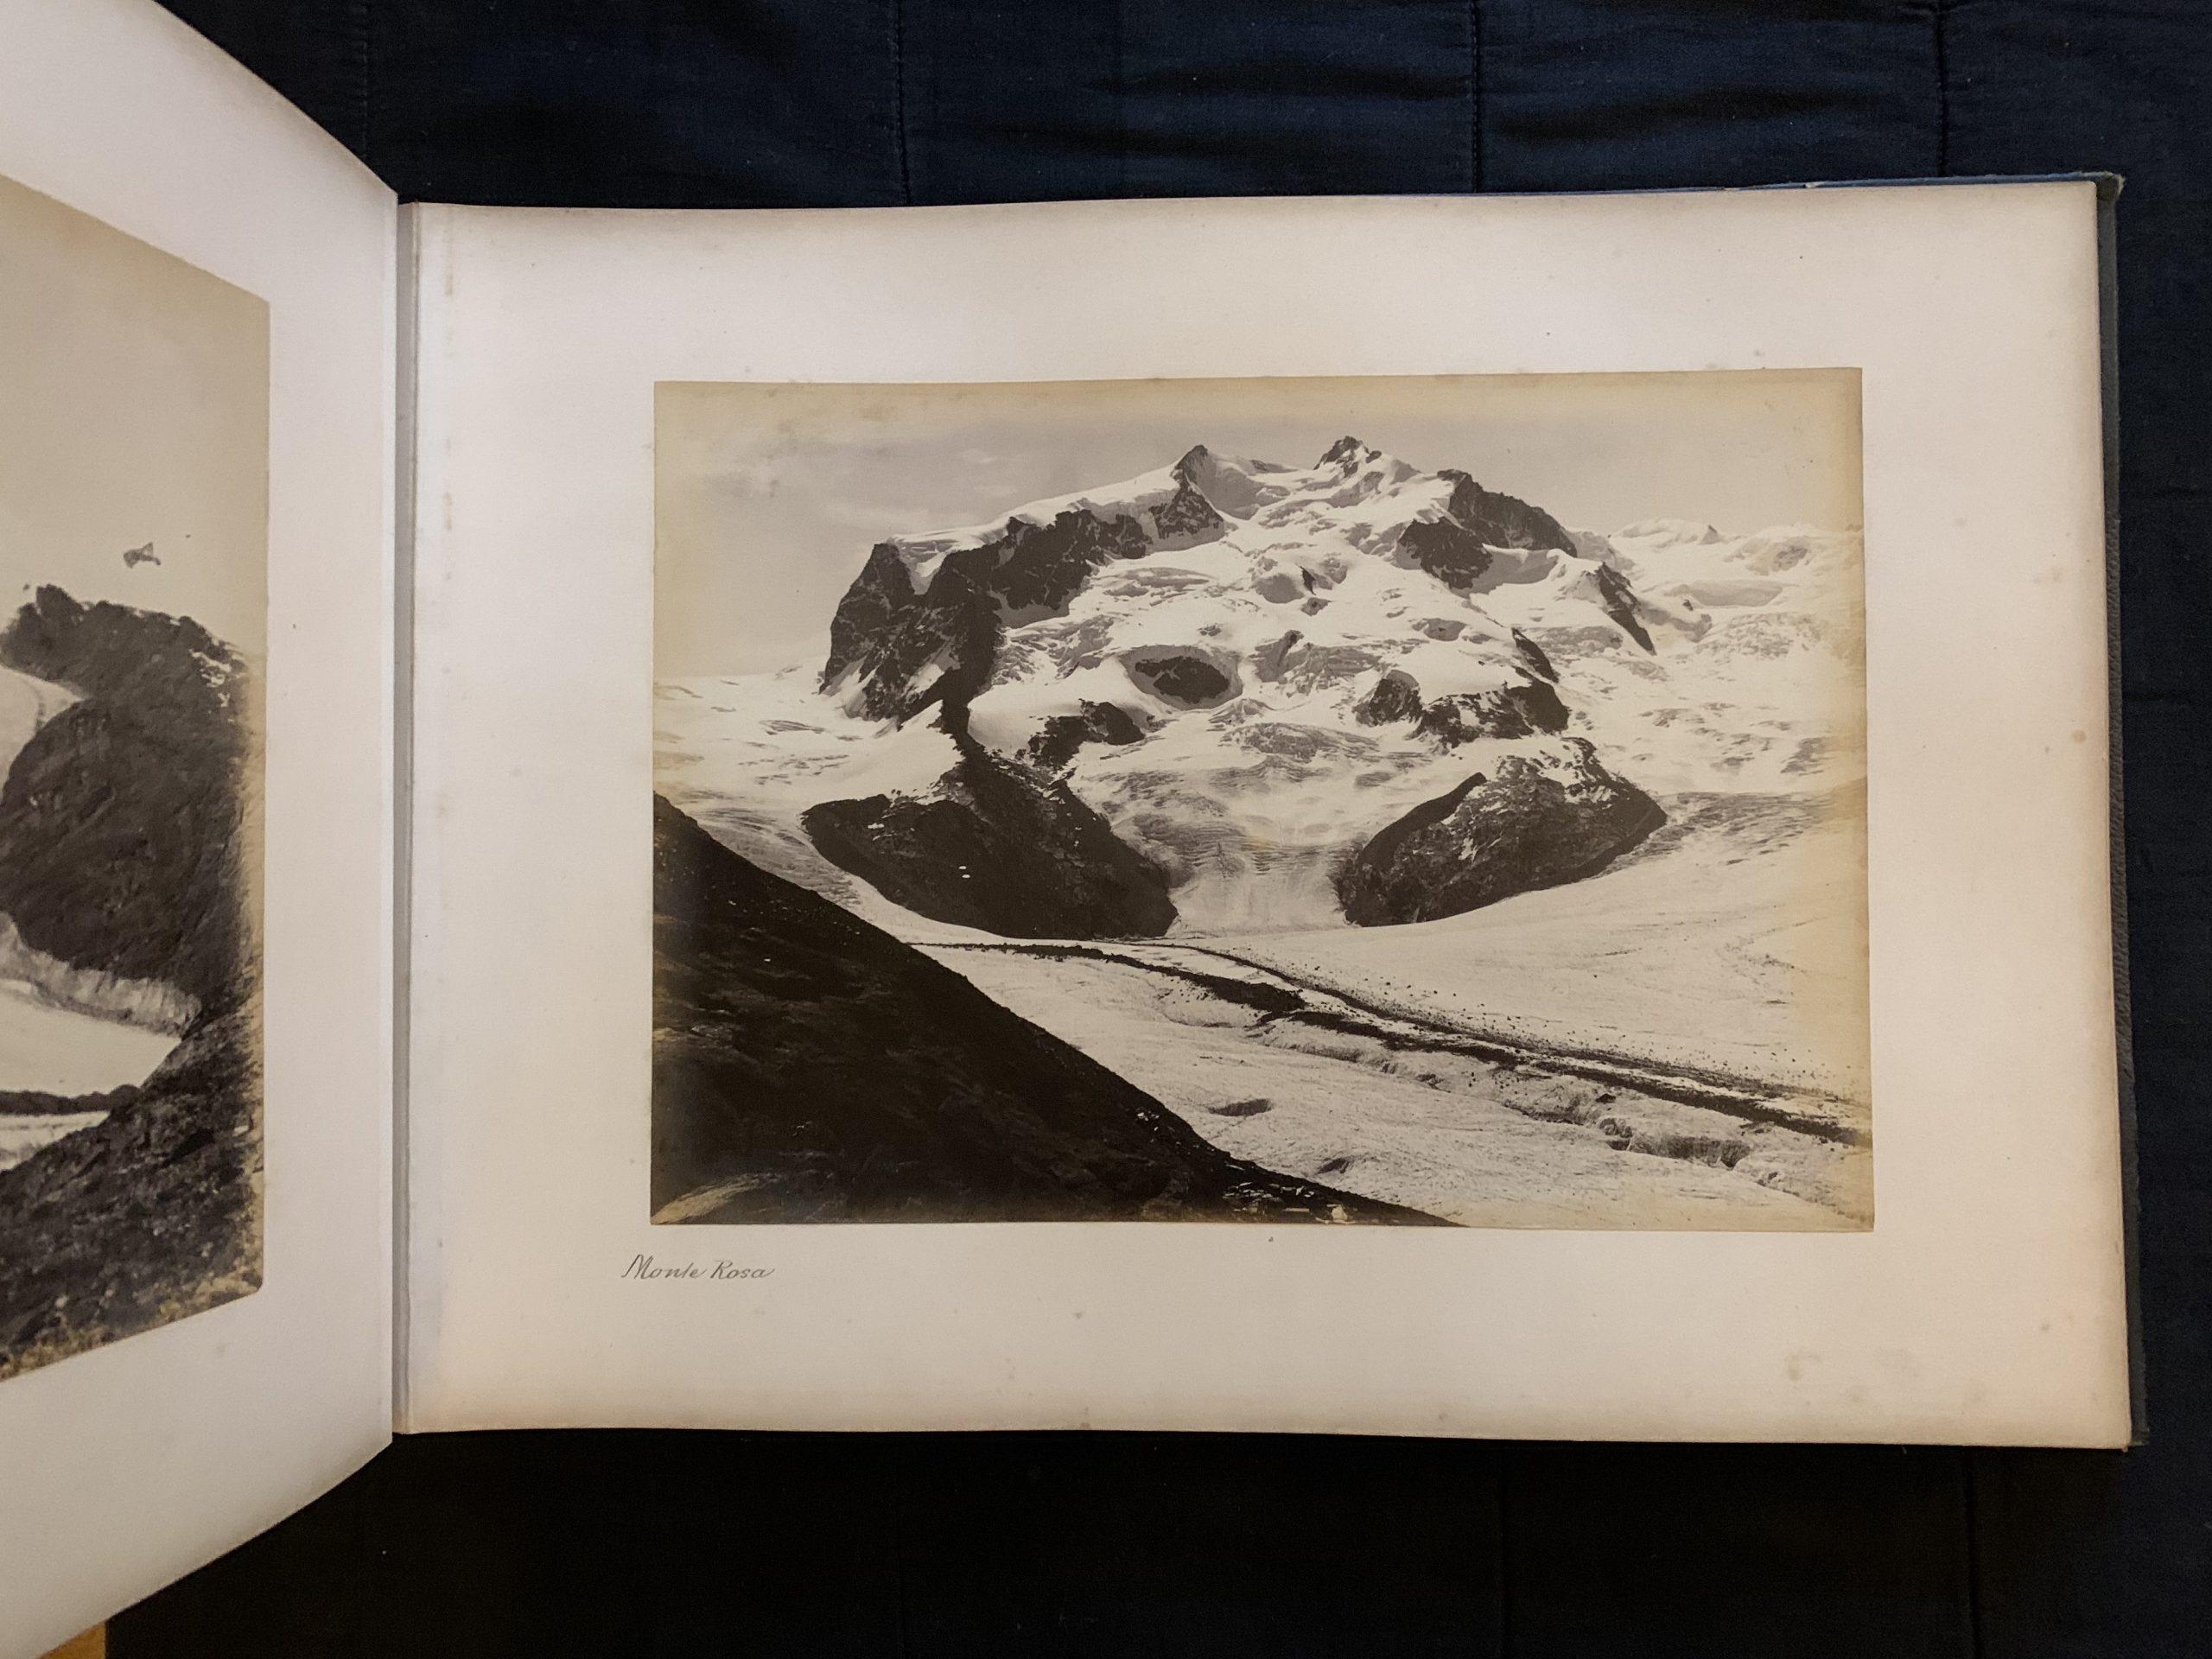 Photographic Album of Switzerland